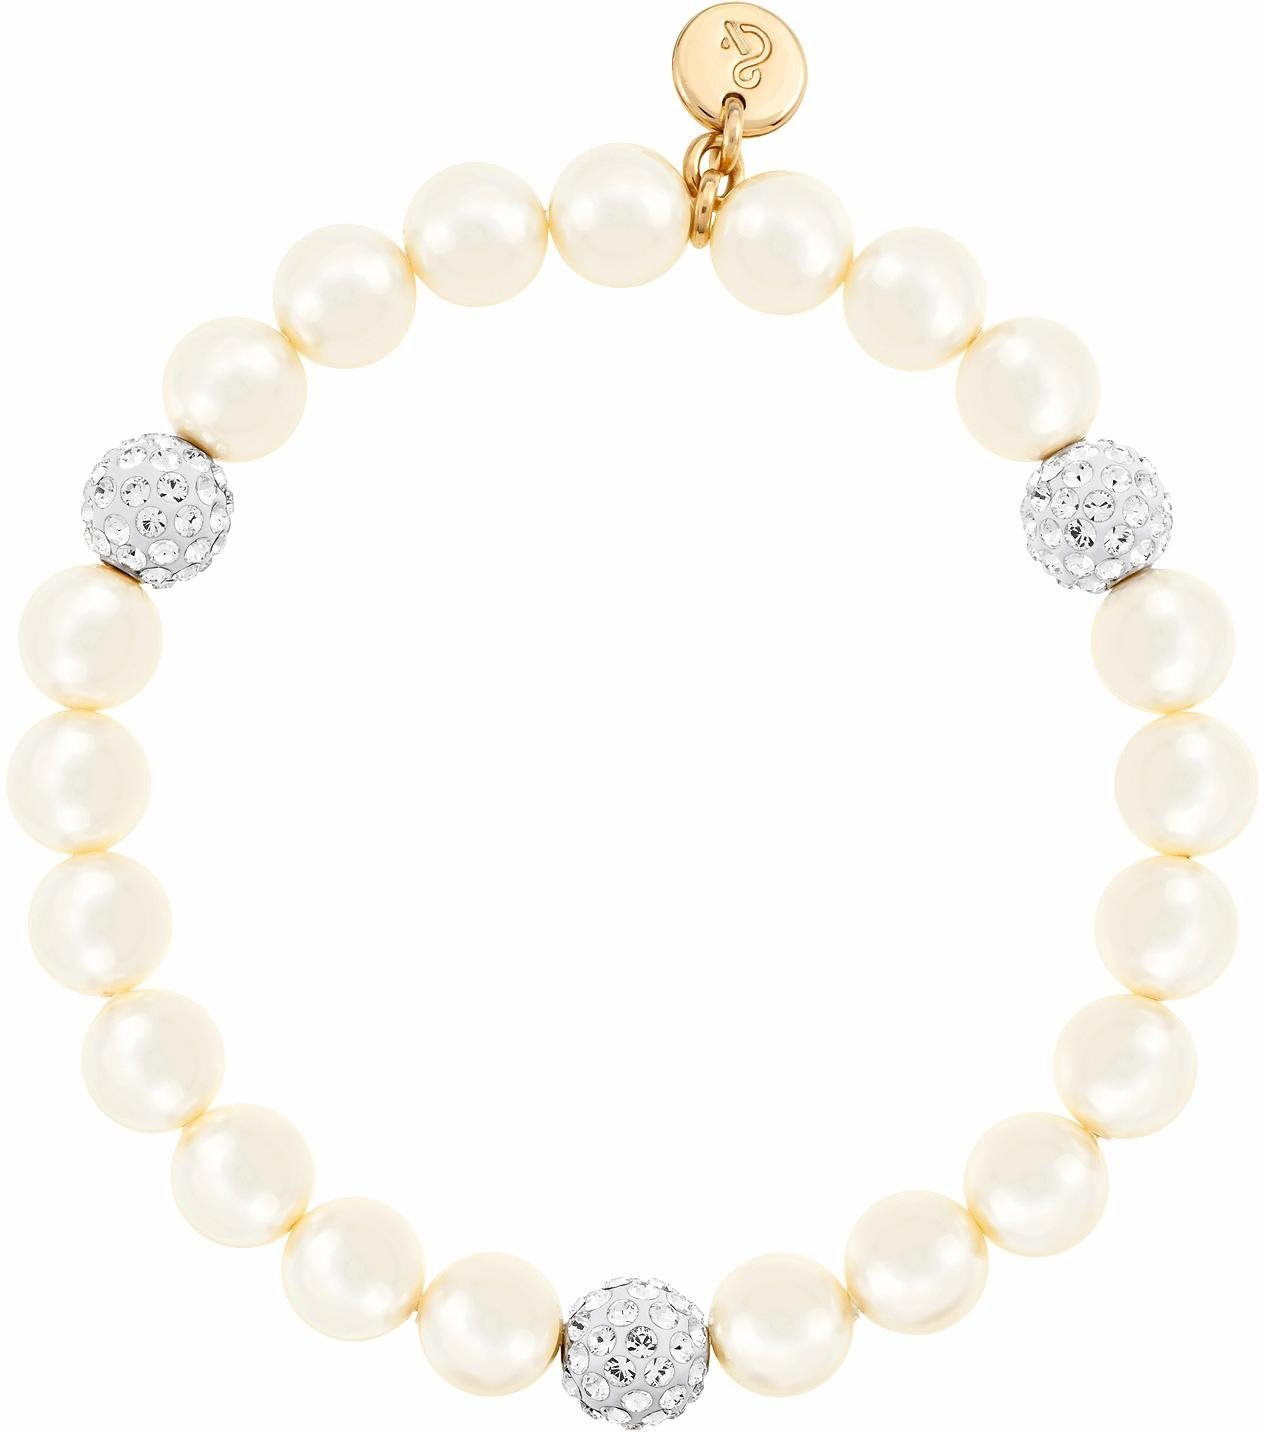 Lolaandgrace Armband »OCEAN STRETCH BRACELET, 5140975«, mit Swarovski® Perlen